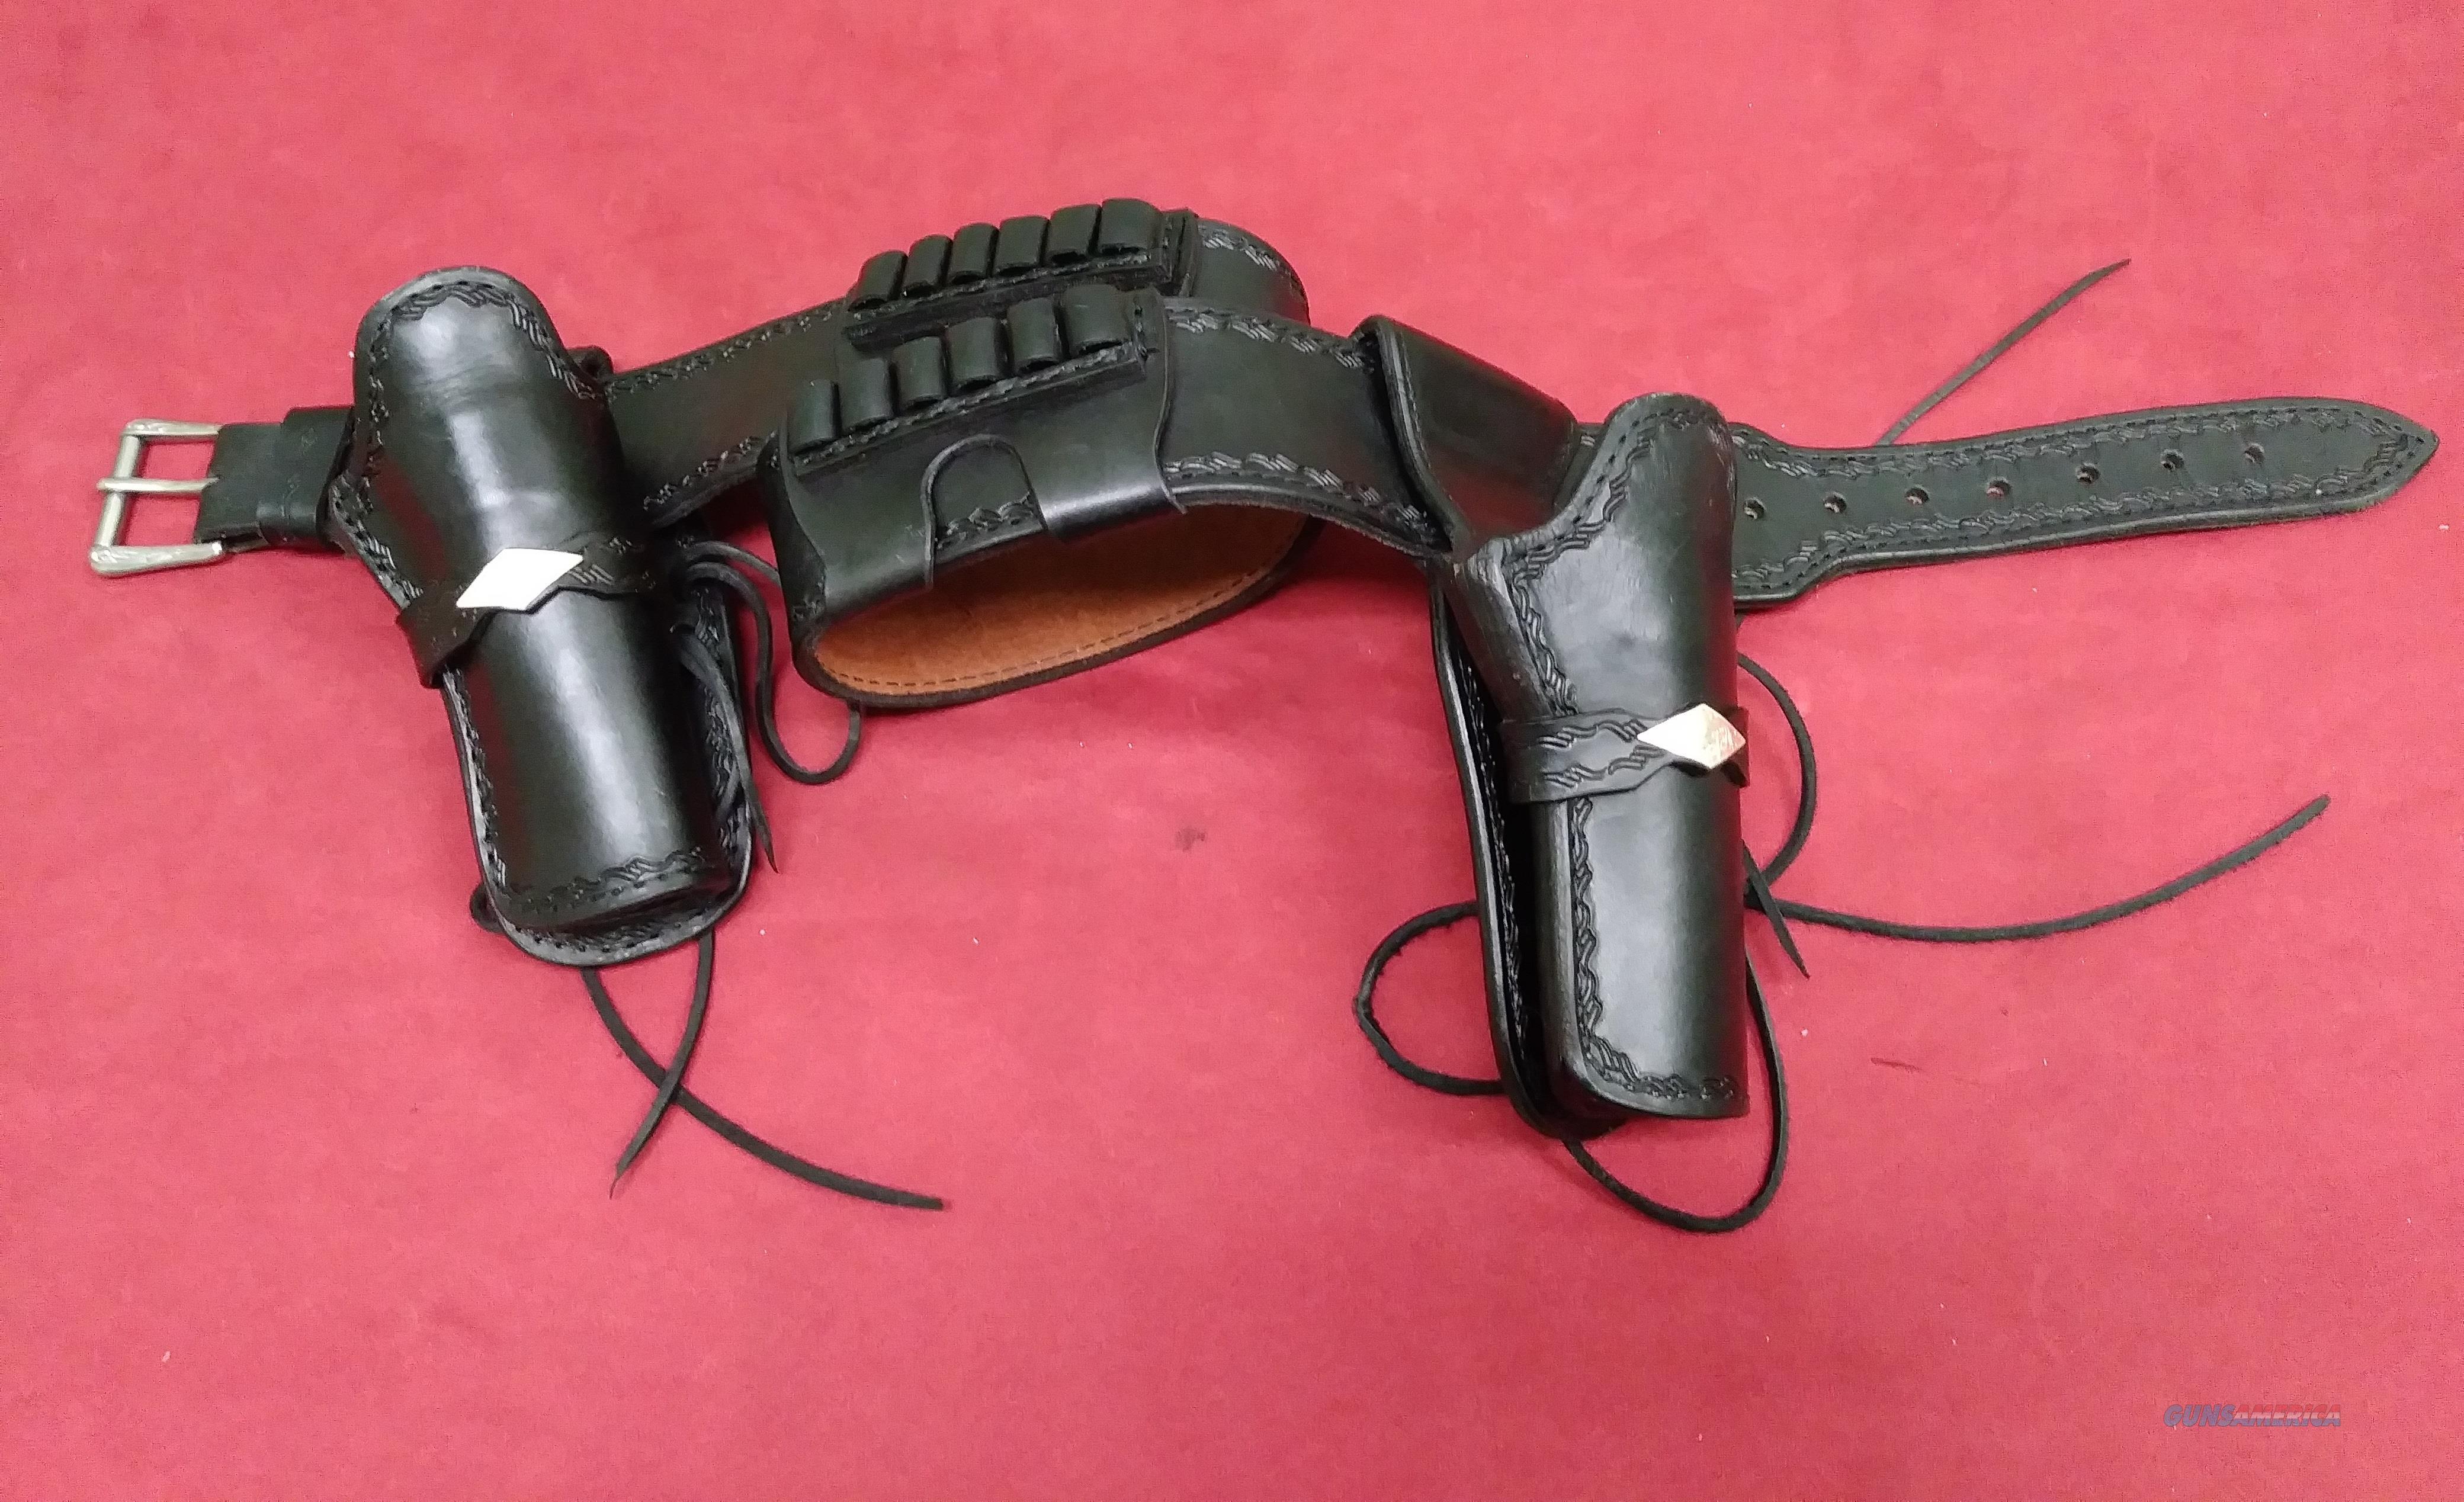 Bob Mernickle Gunbelt, .45 Colt Loops, 2 Holsters  Non-Guns > Cowboy Action/Western